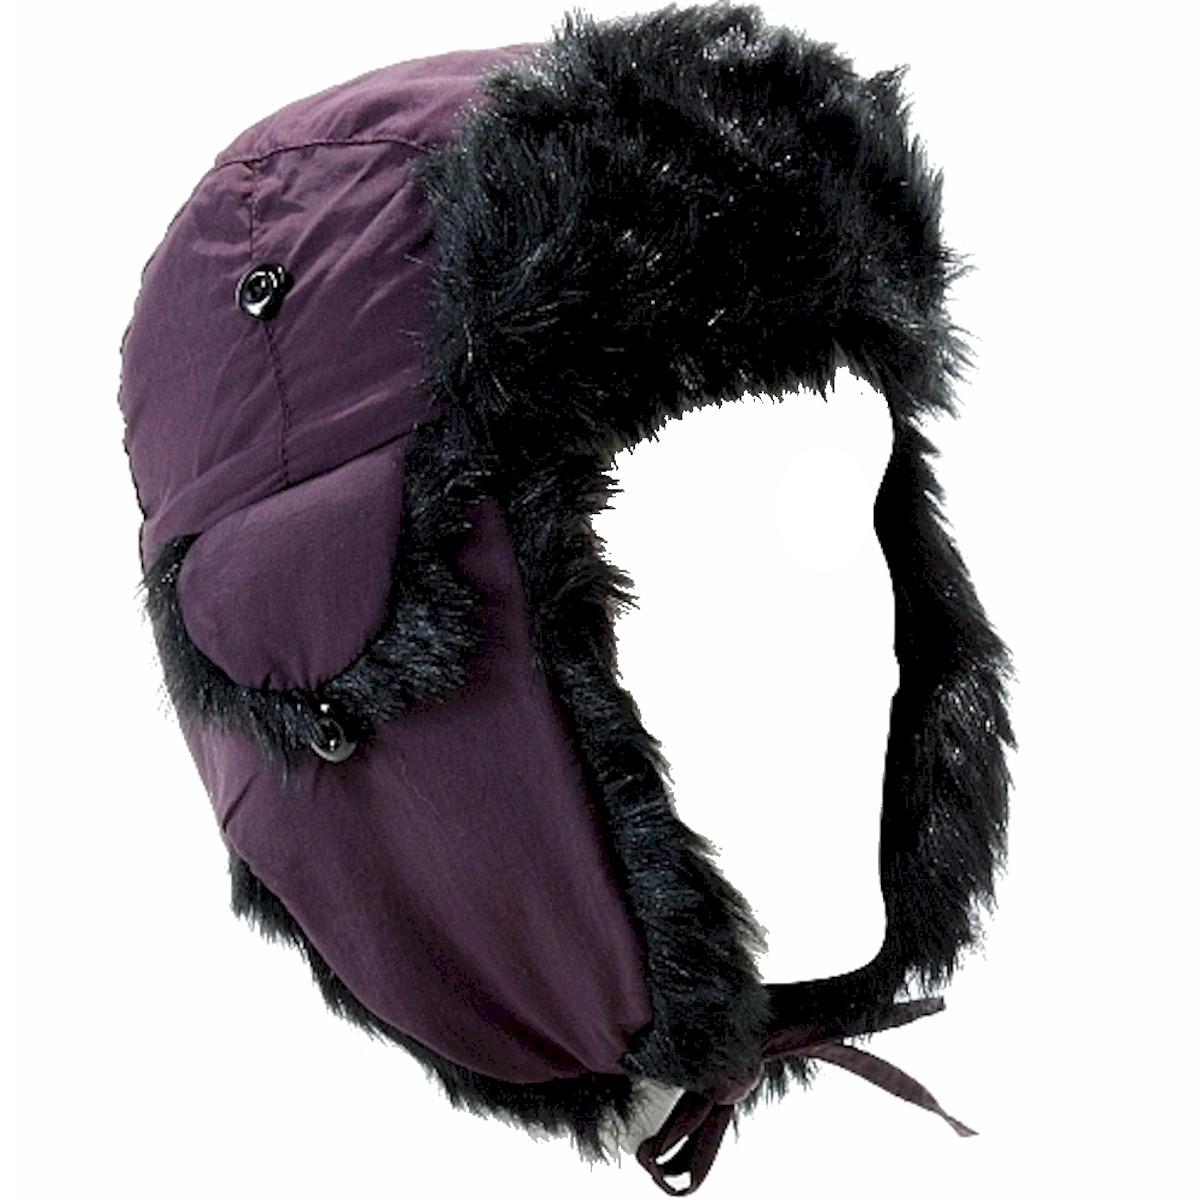 Image of Scala Pronto Faux Fur Trimmed Trooper Cap Hat - Purple - One Size